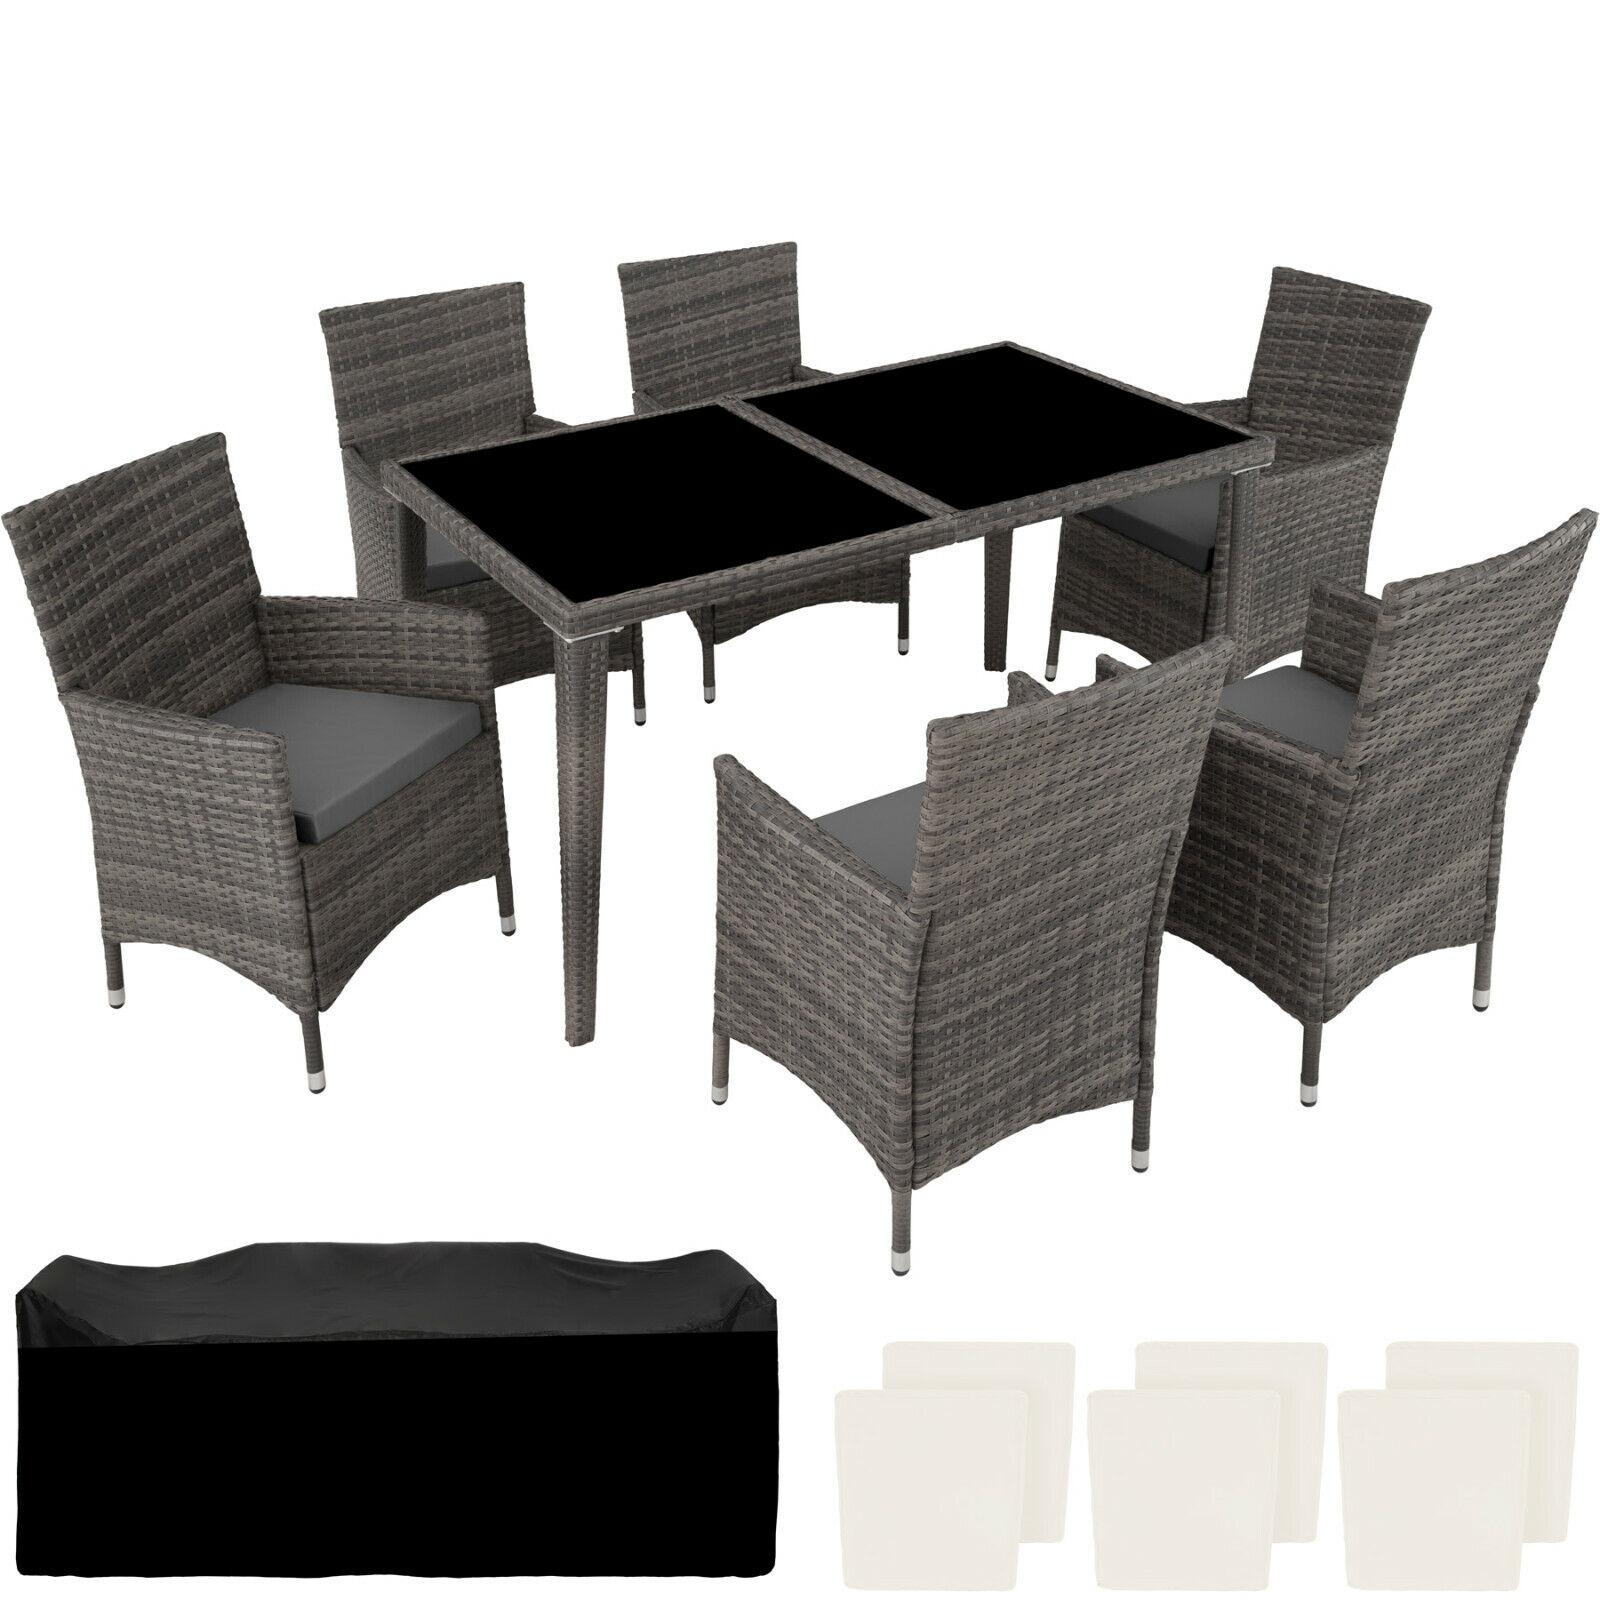 Poly Rattan Aluminium Gartenmöbel Essgruppe Sitzgruppe Gartengarnitur 6+1 grau